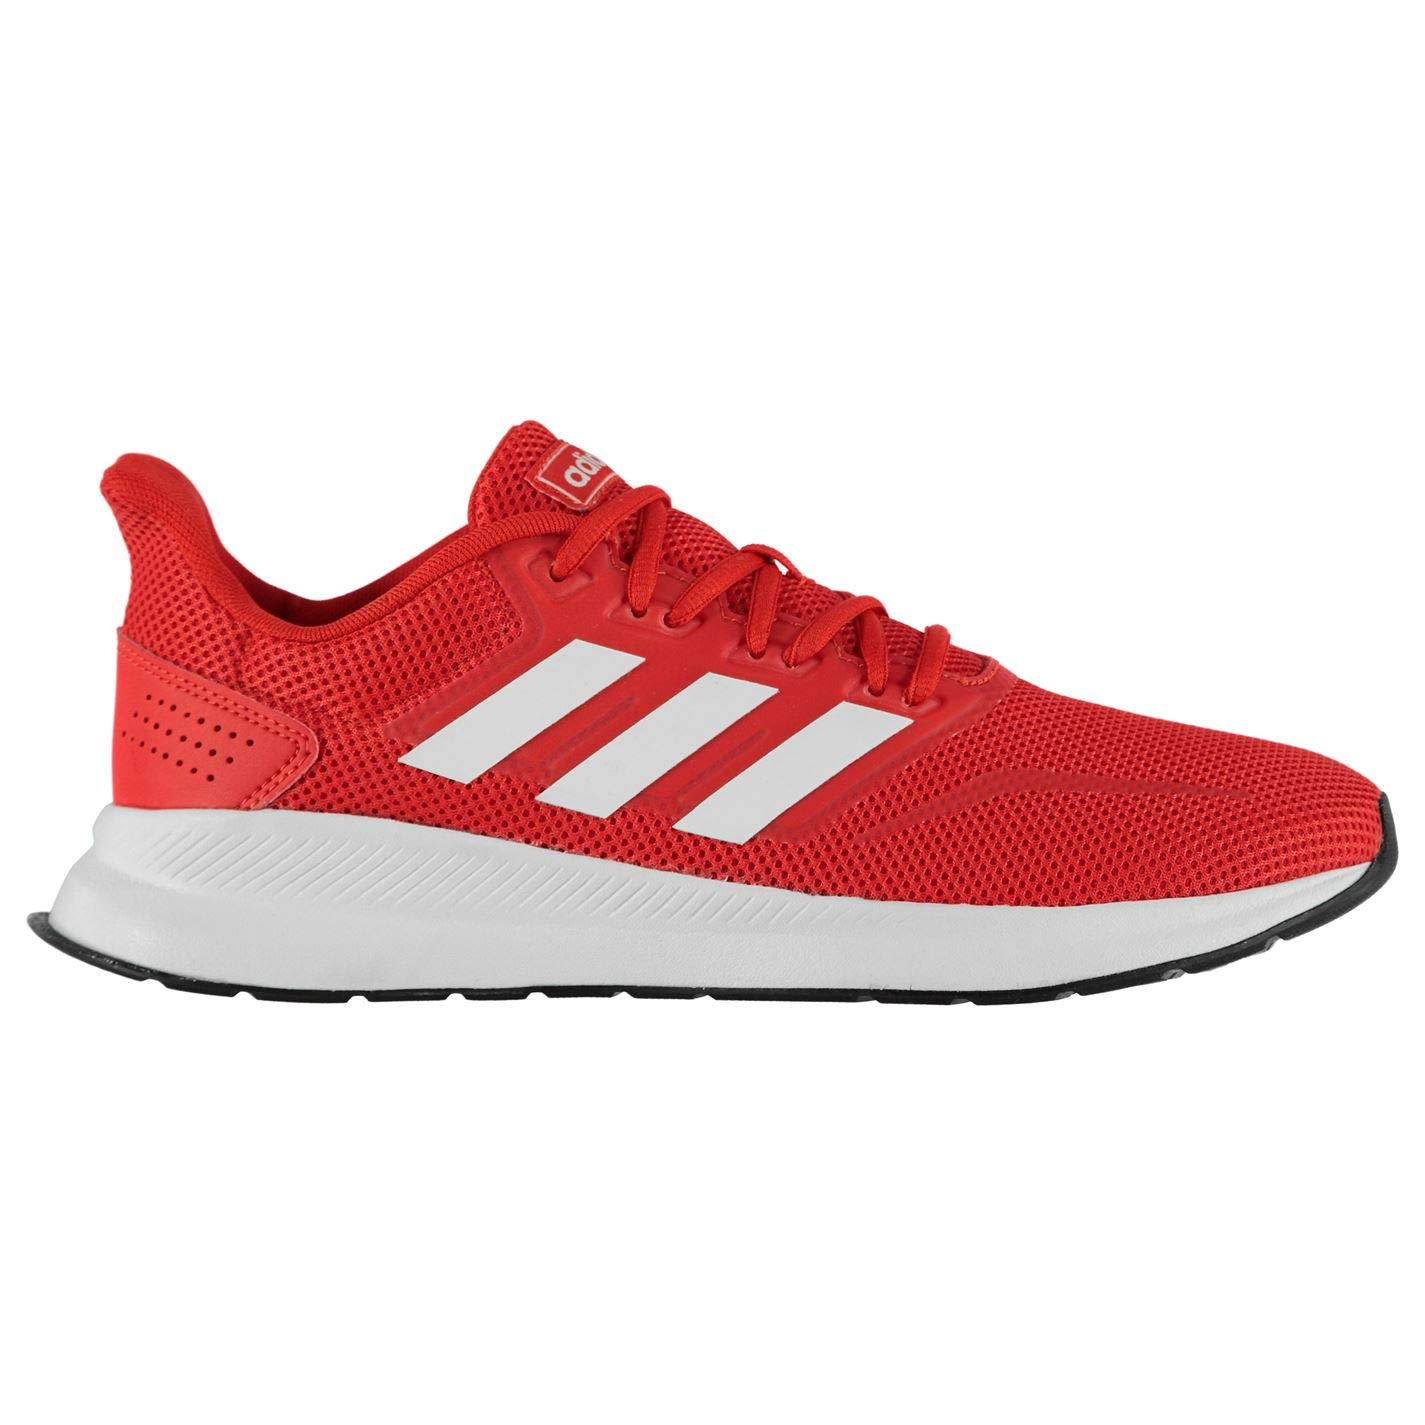 adidas Men's Falcon Running Shoes G28729